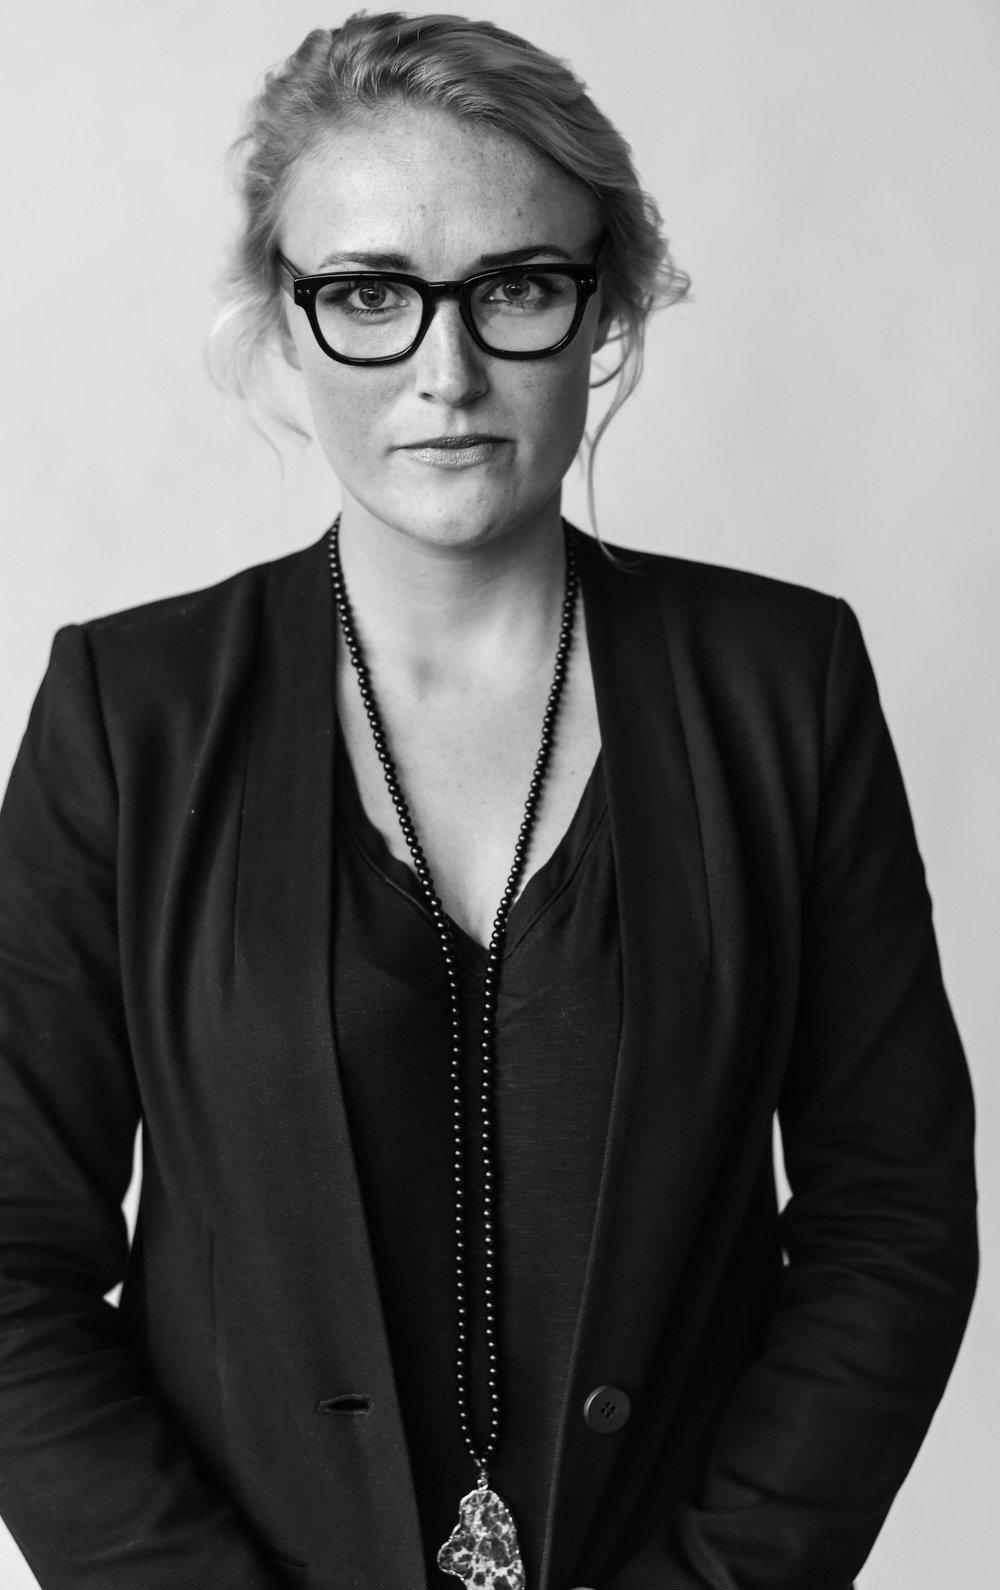 Paige Gardiner Founder, CEO